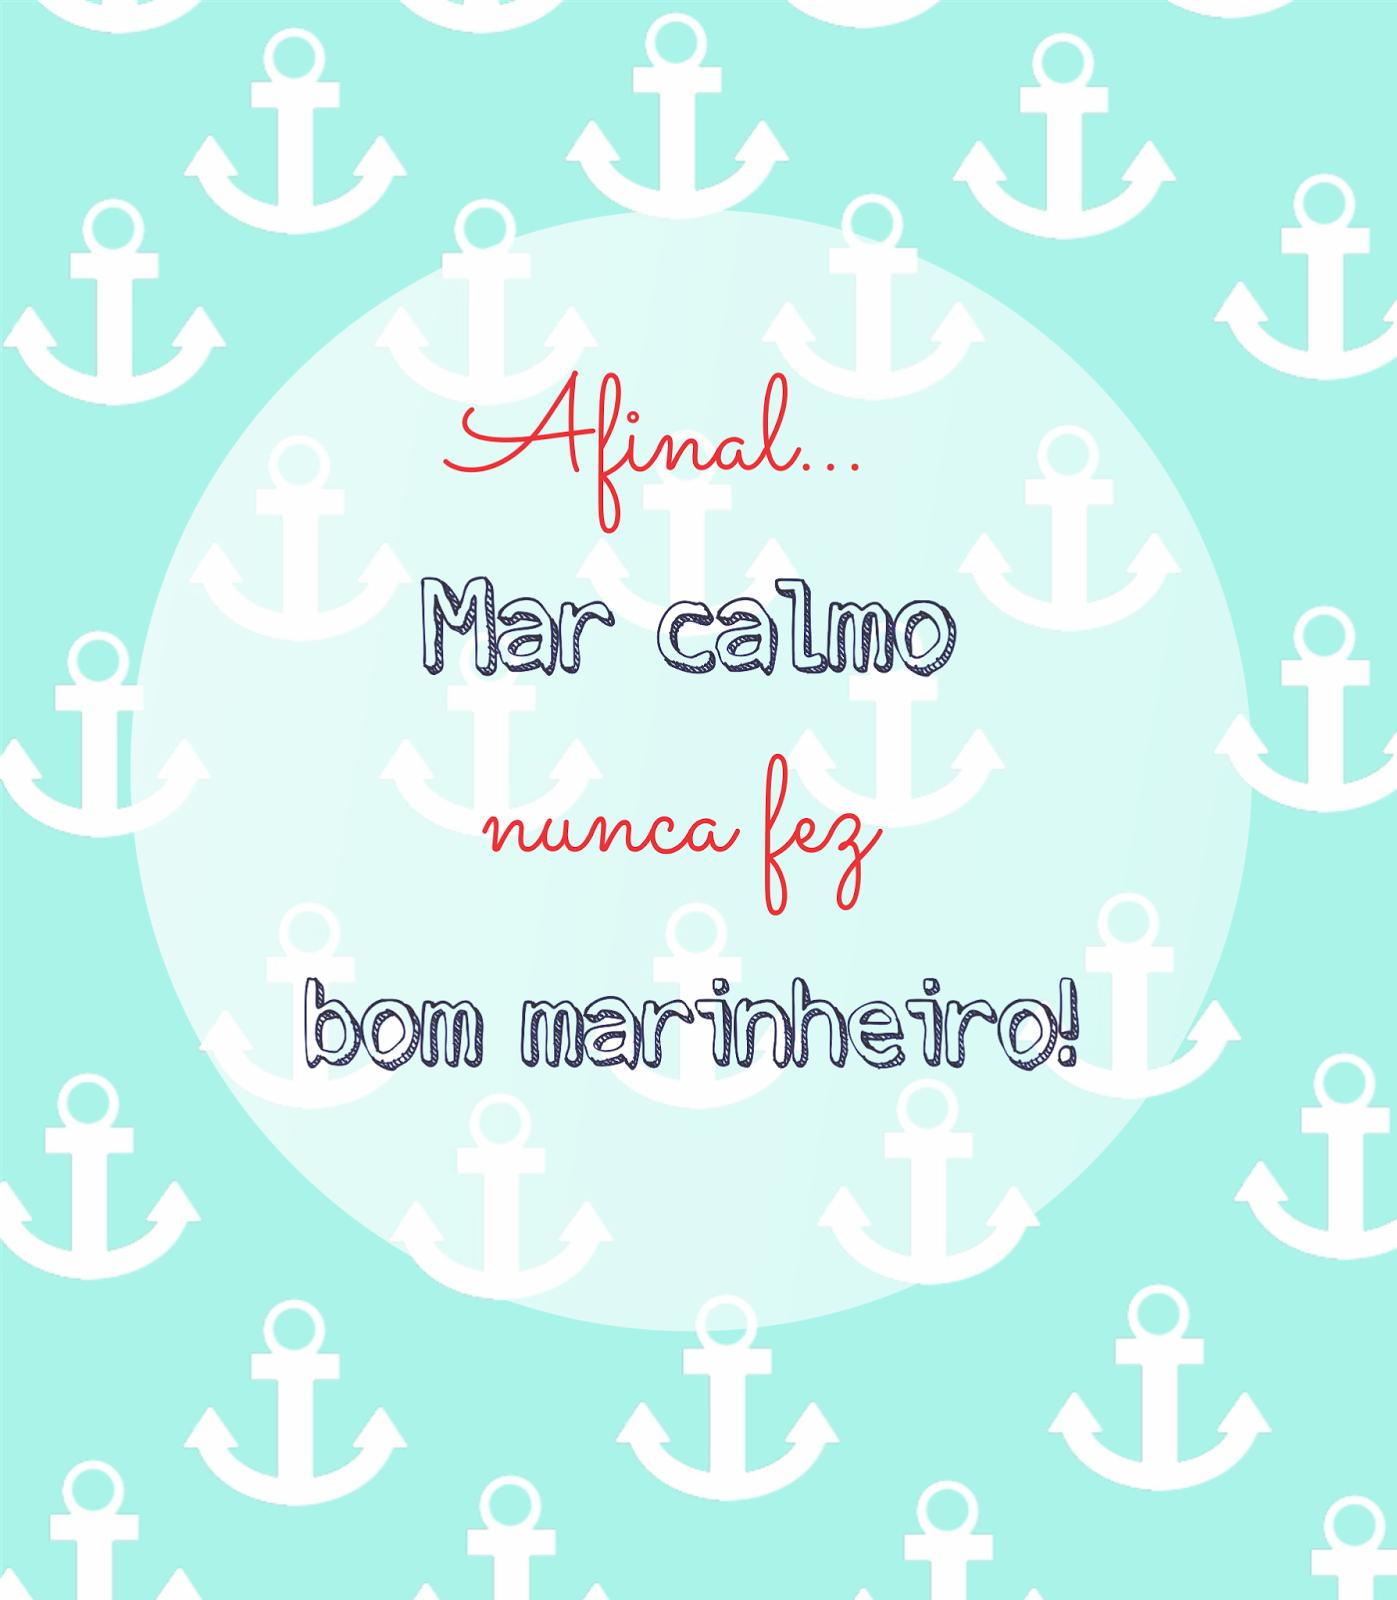 Ensaio Publicitário Frase Da Semana Afinal Mar Calmo Nunca Fez